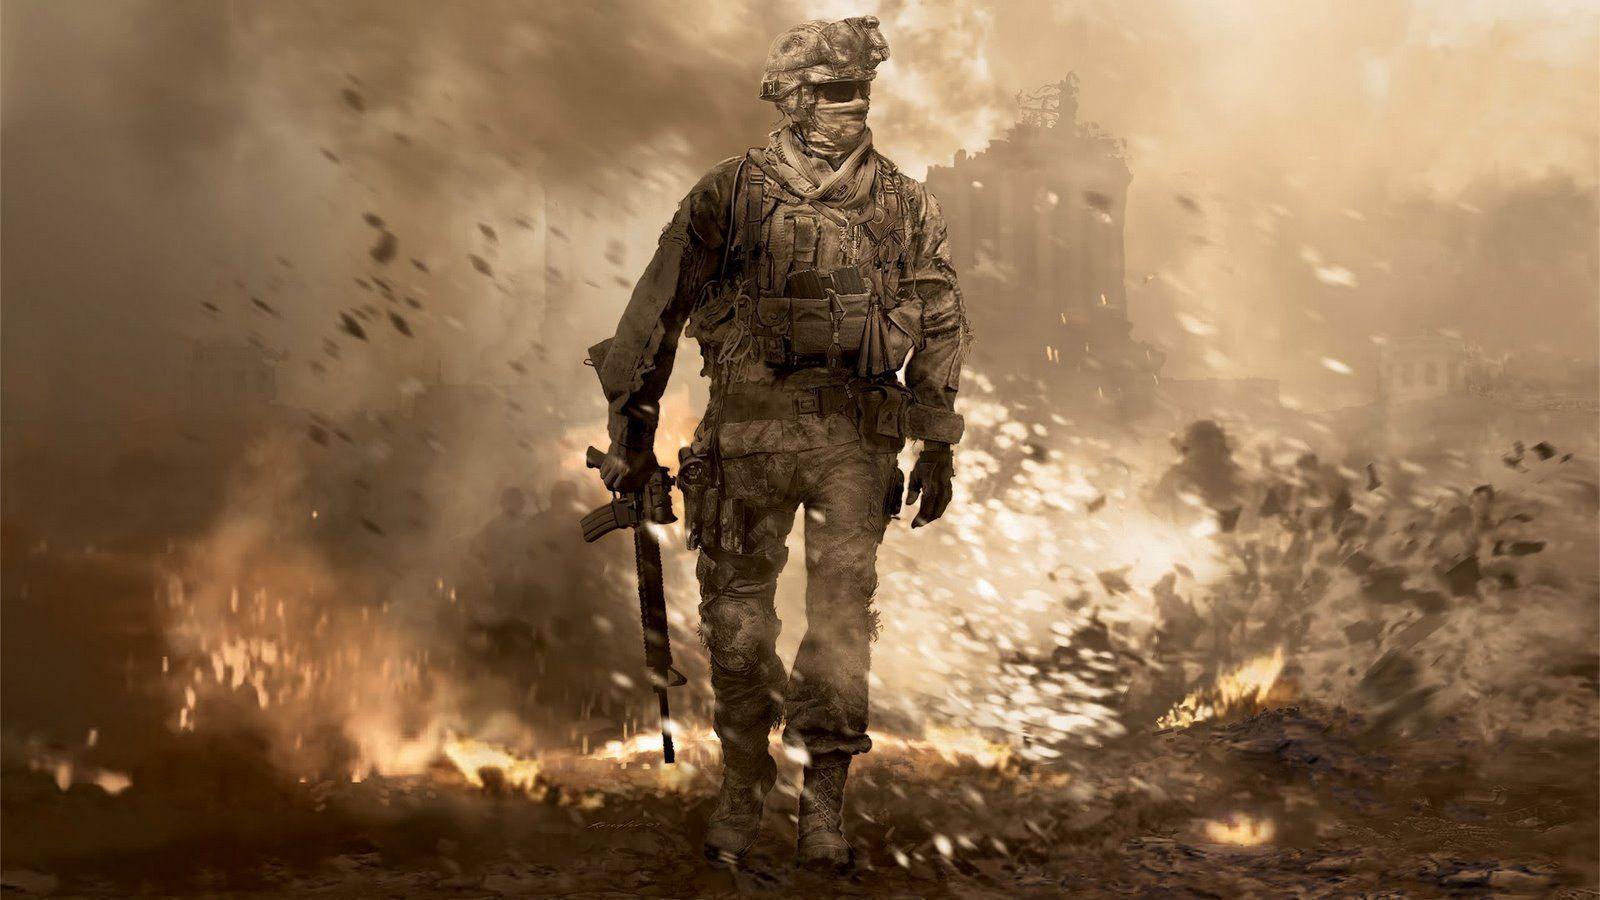 Wallpapers hd de Halo, Gears of War y Call of Duty! - Taringa!